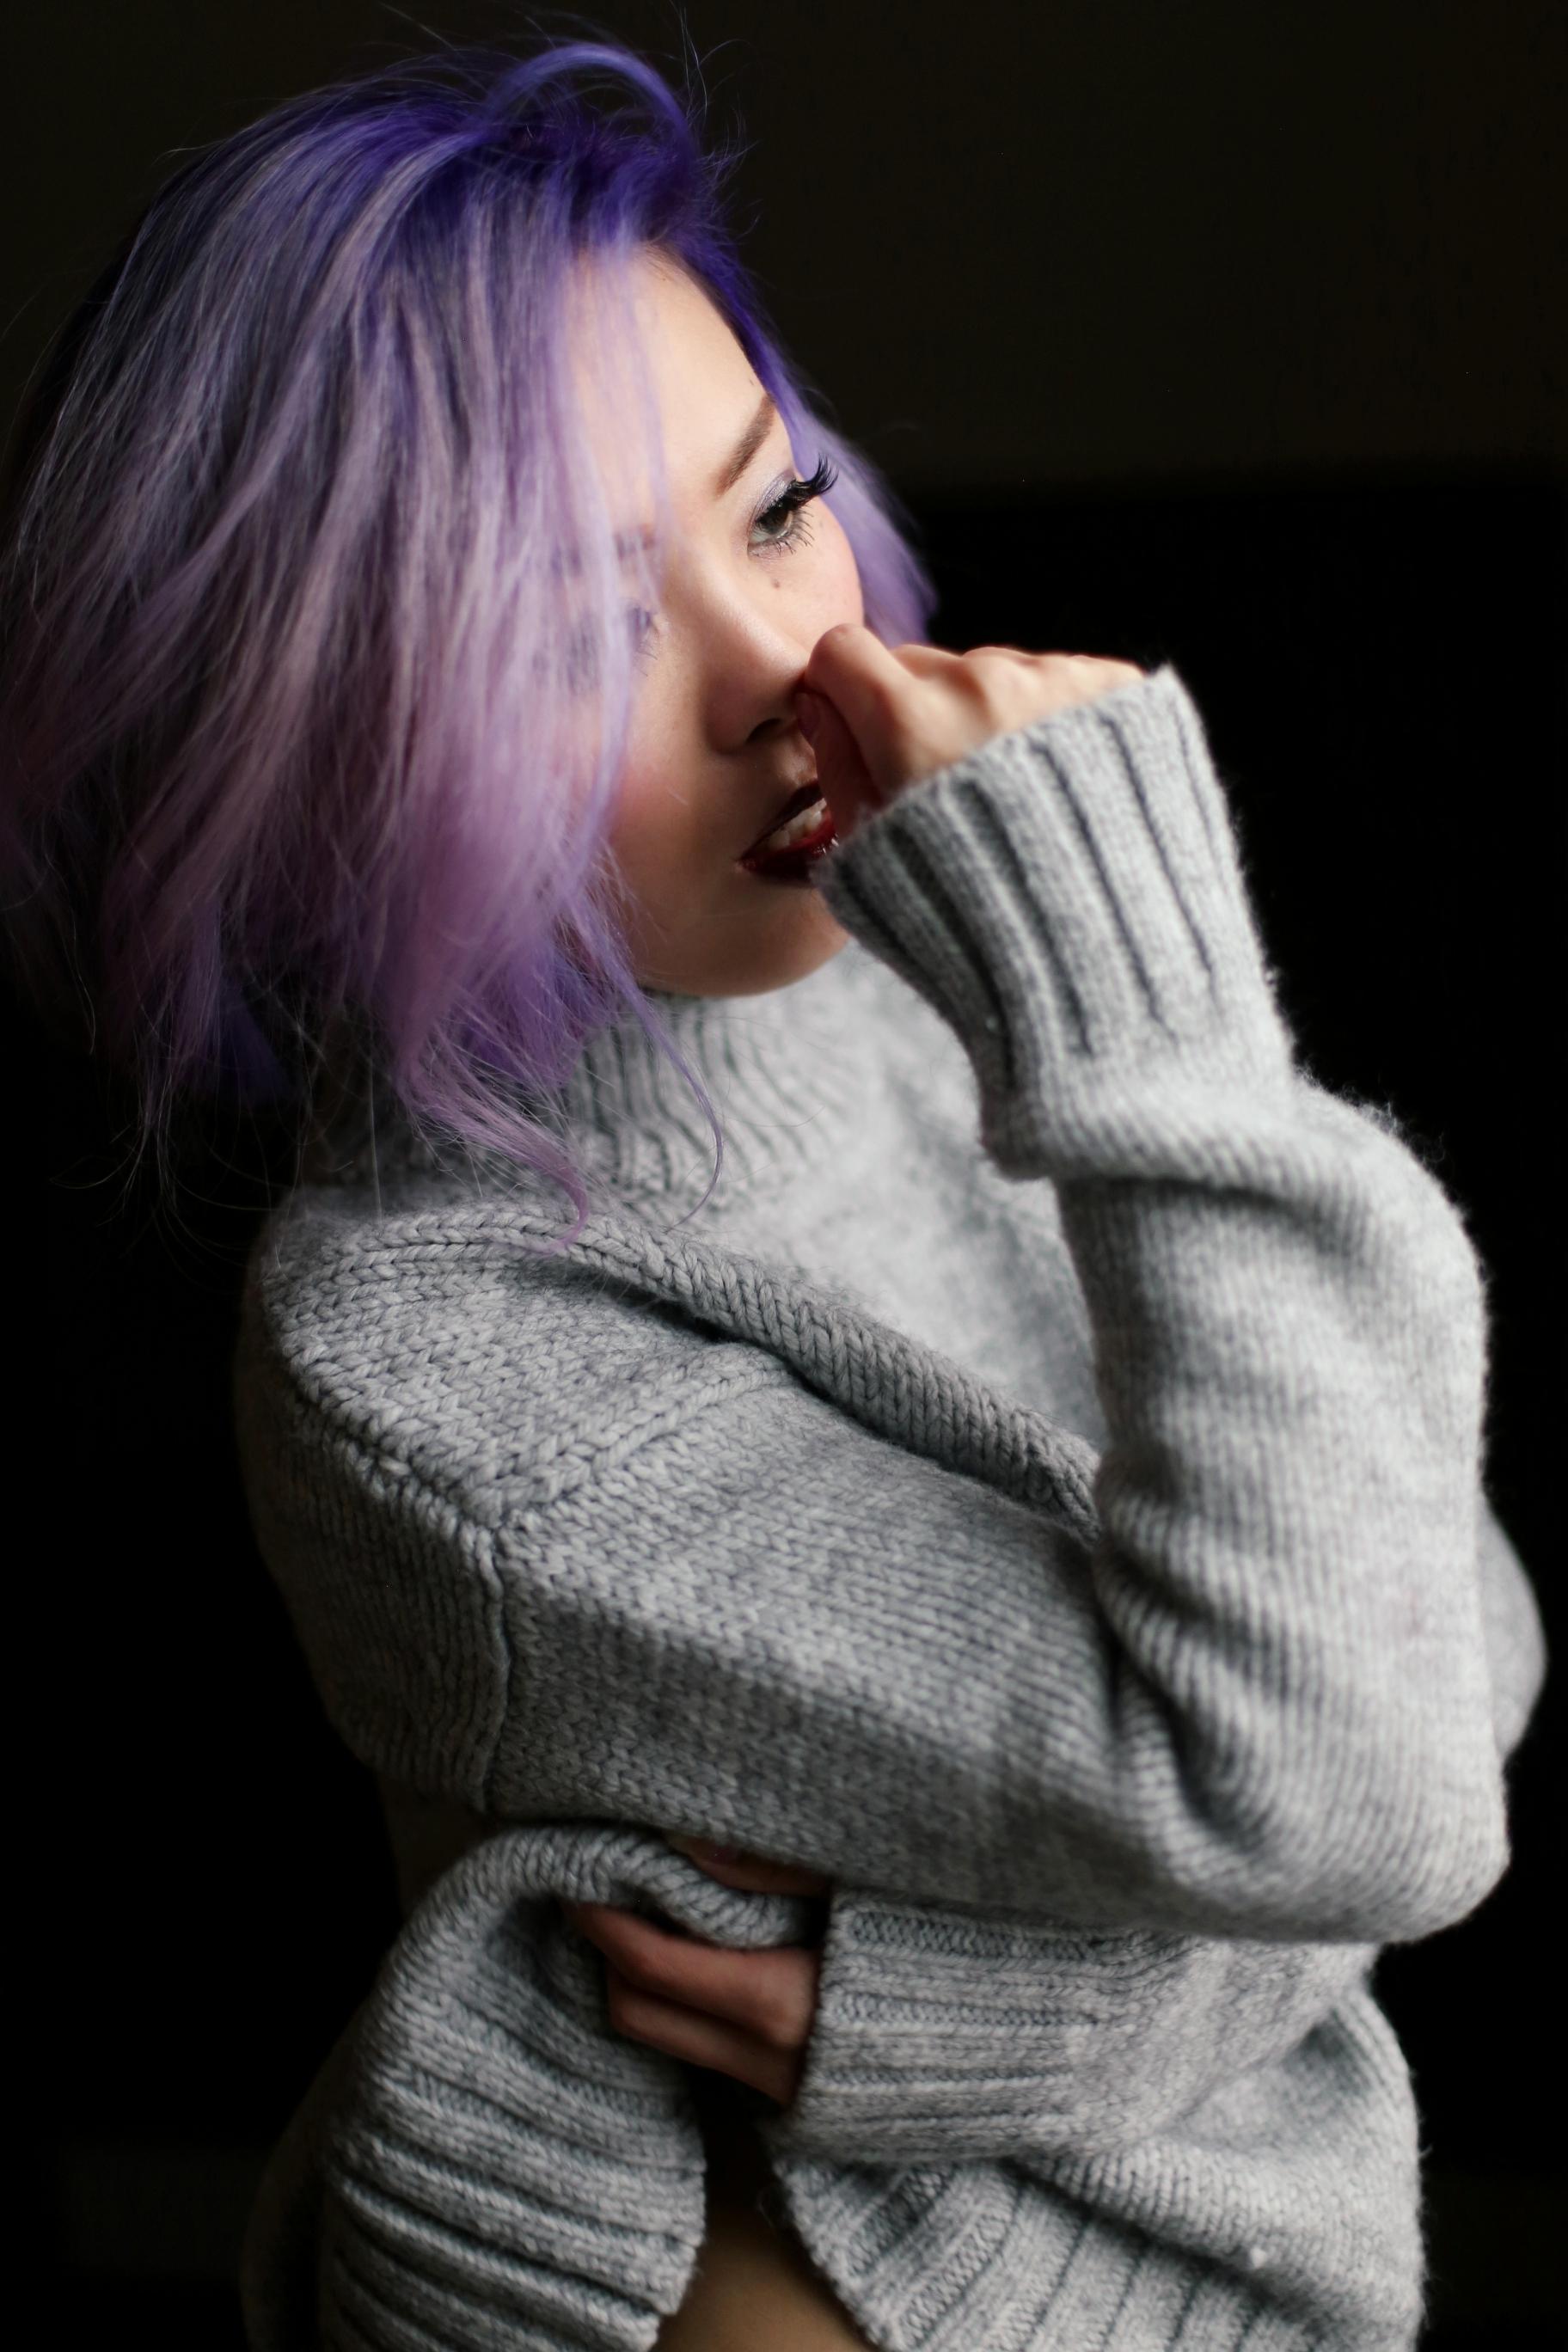 Boudoir Photo-black and white photography-sweater weather-turtle neck sweater-black lingerie-dark lipstick-japanese-Aika's Love Closet-Seattle model-Seattle Style blogger-Lavender Hair-colored Hair-Mermaid Hair-Zara Sweater 14